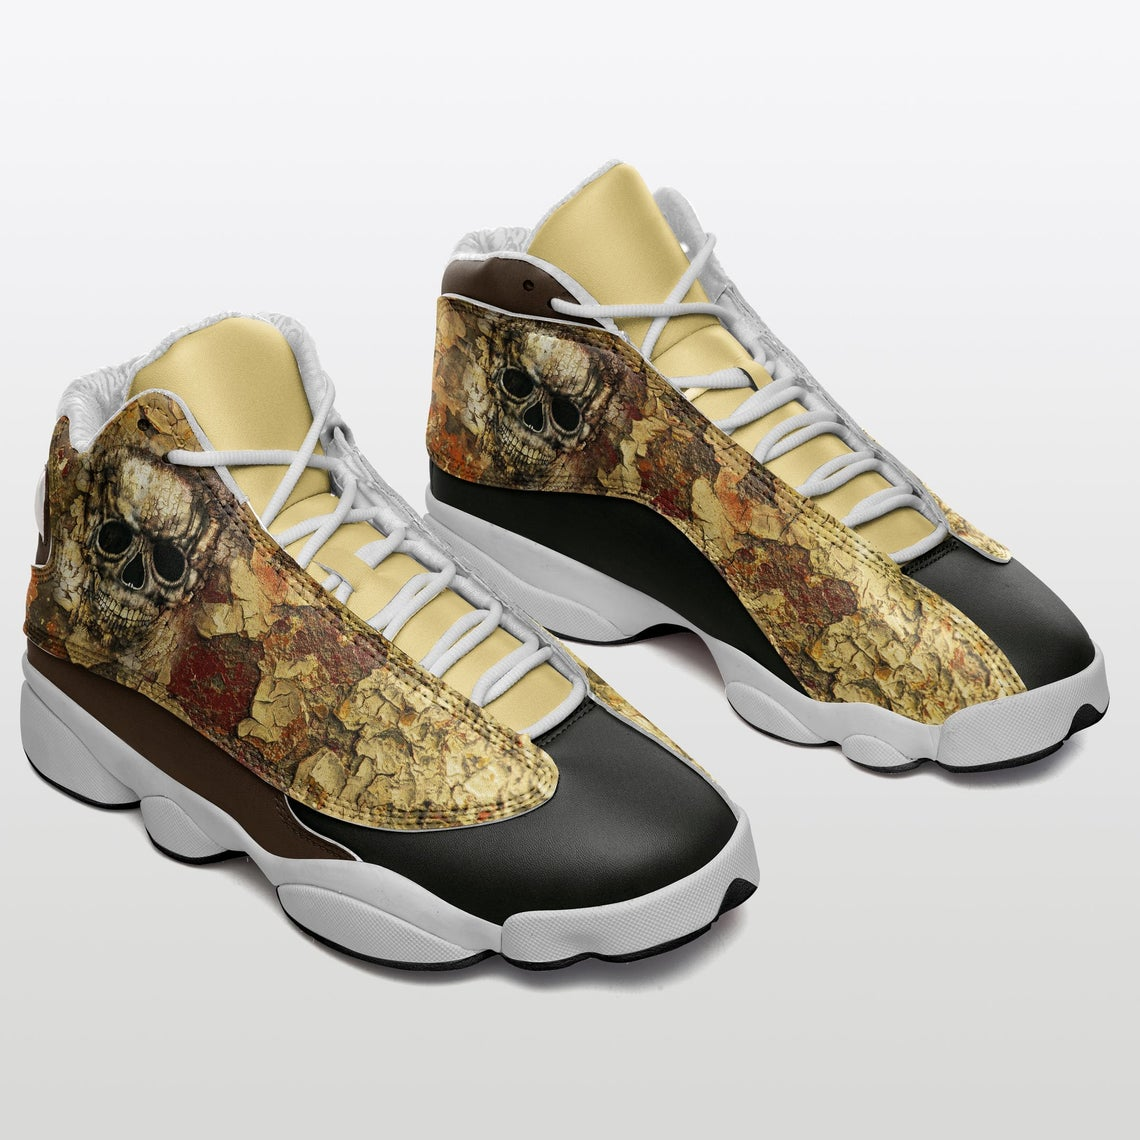 Skull Sku 33 Air Jordan Shoes